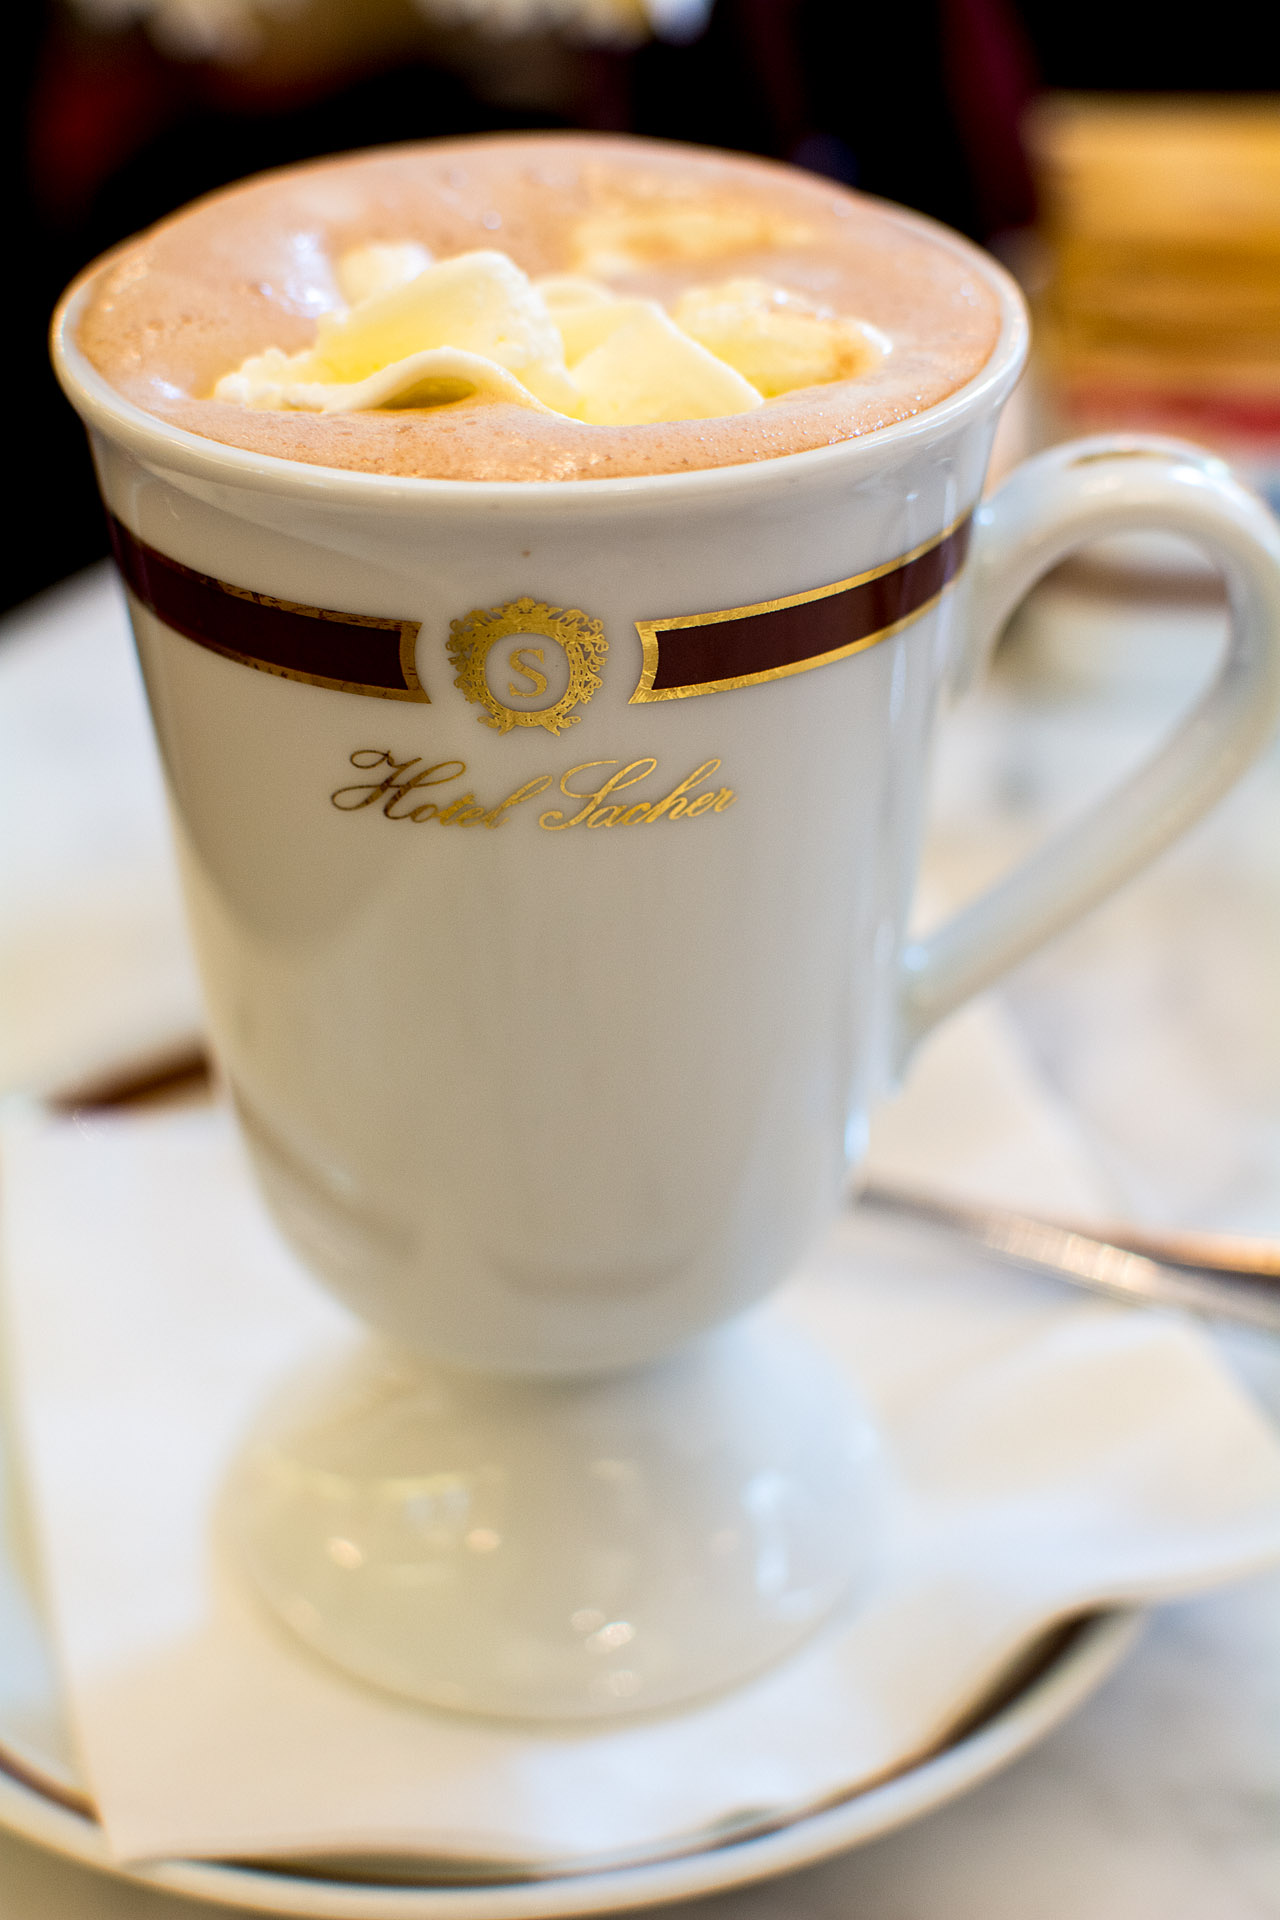 Coffee-hot chocolate blend